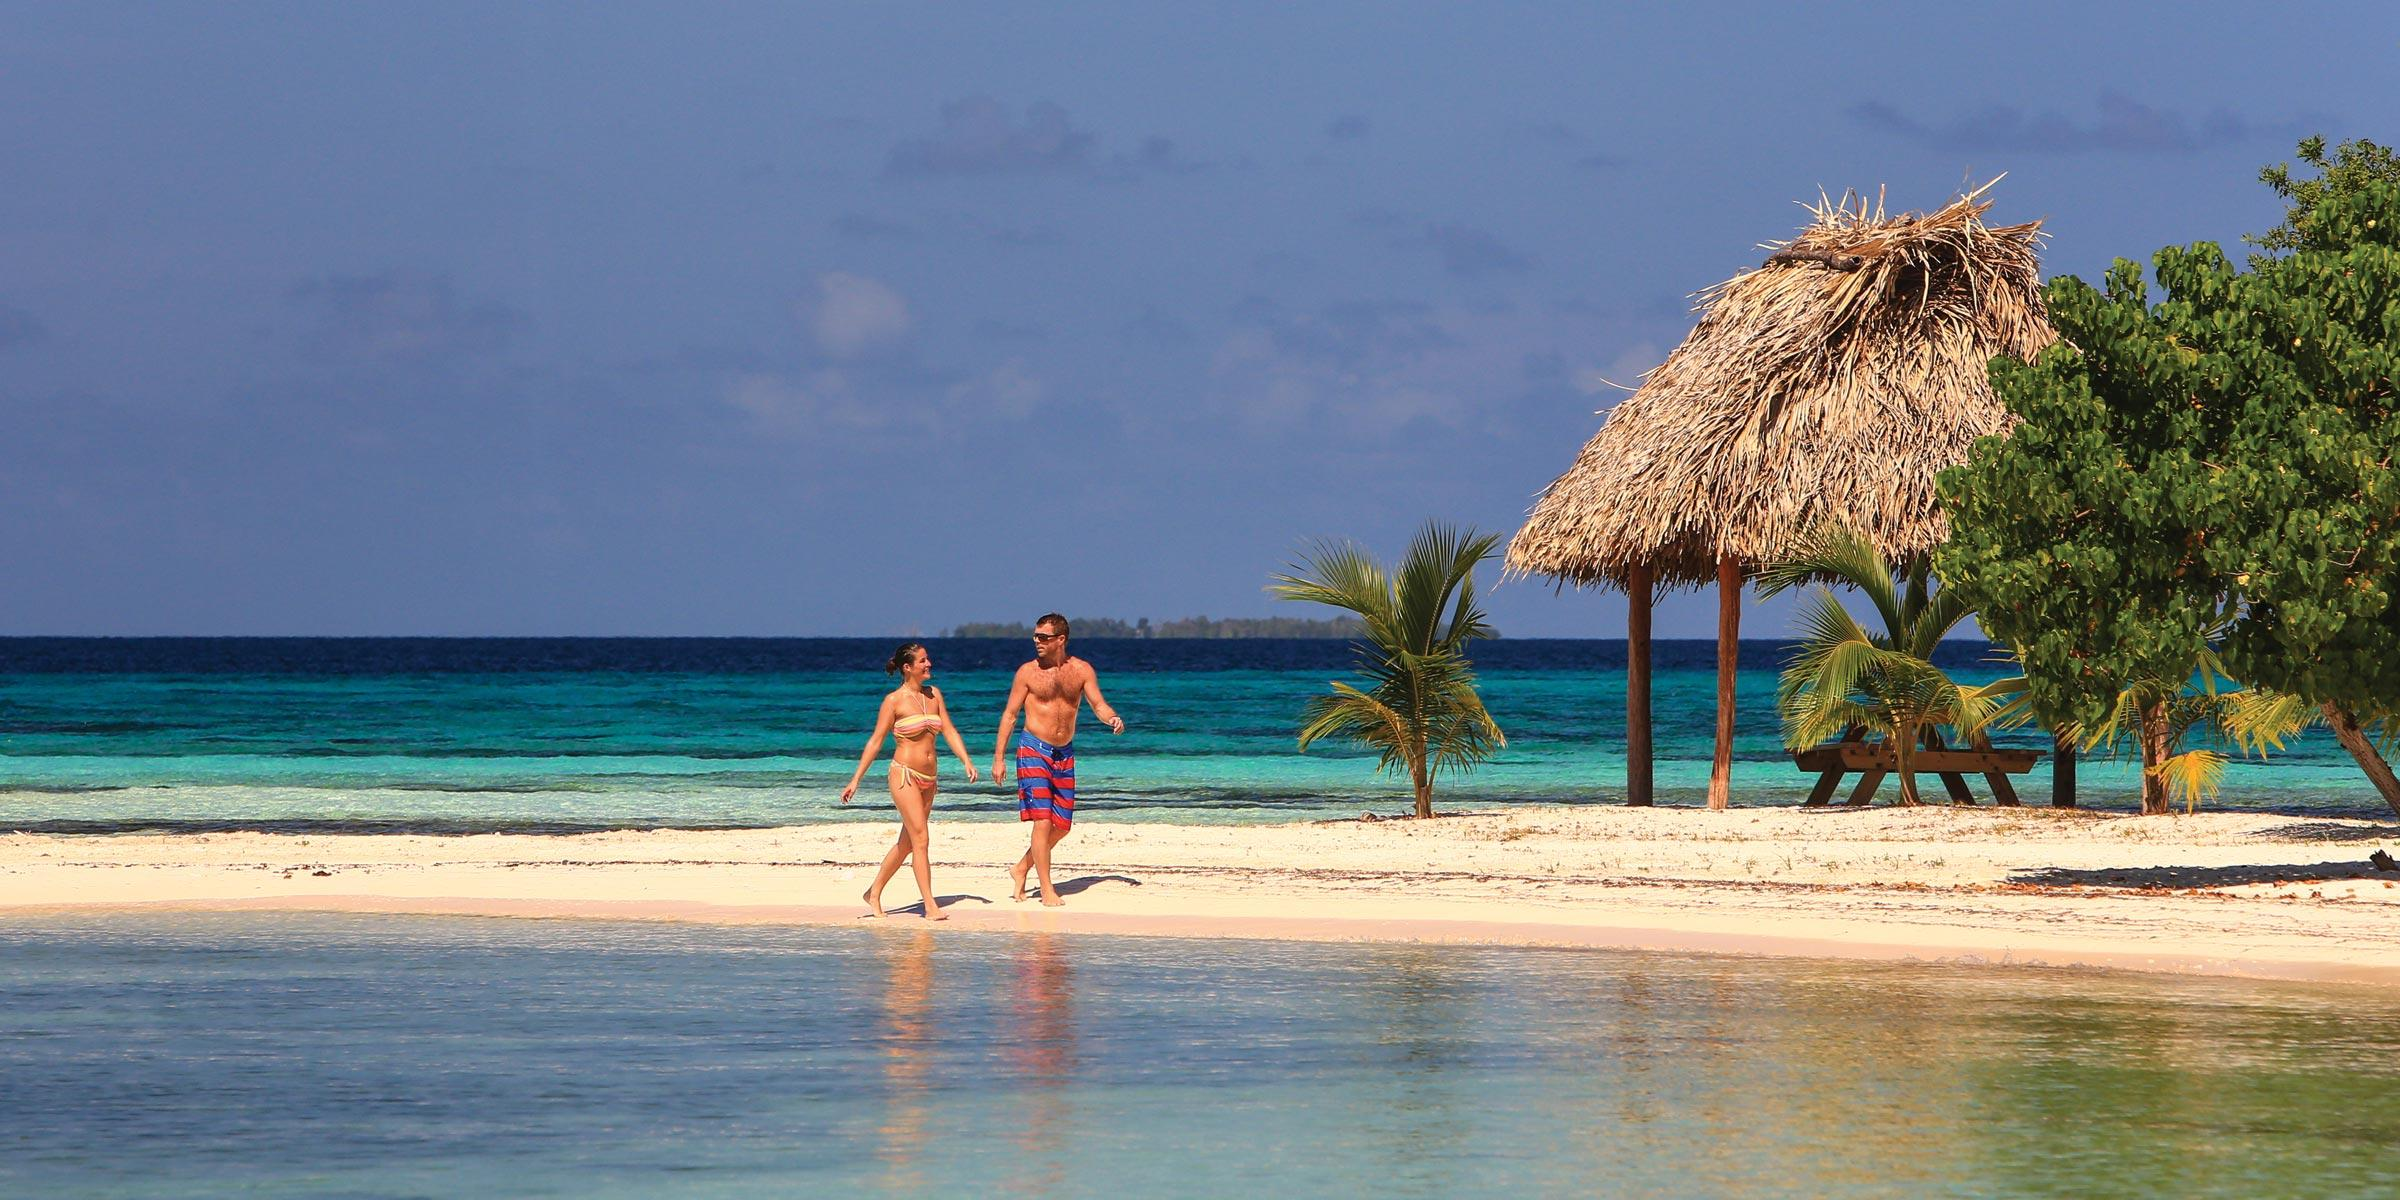 Beach on Moho Cay Belize